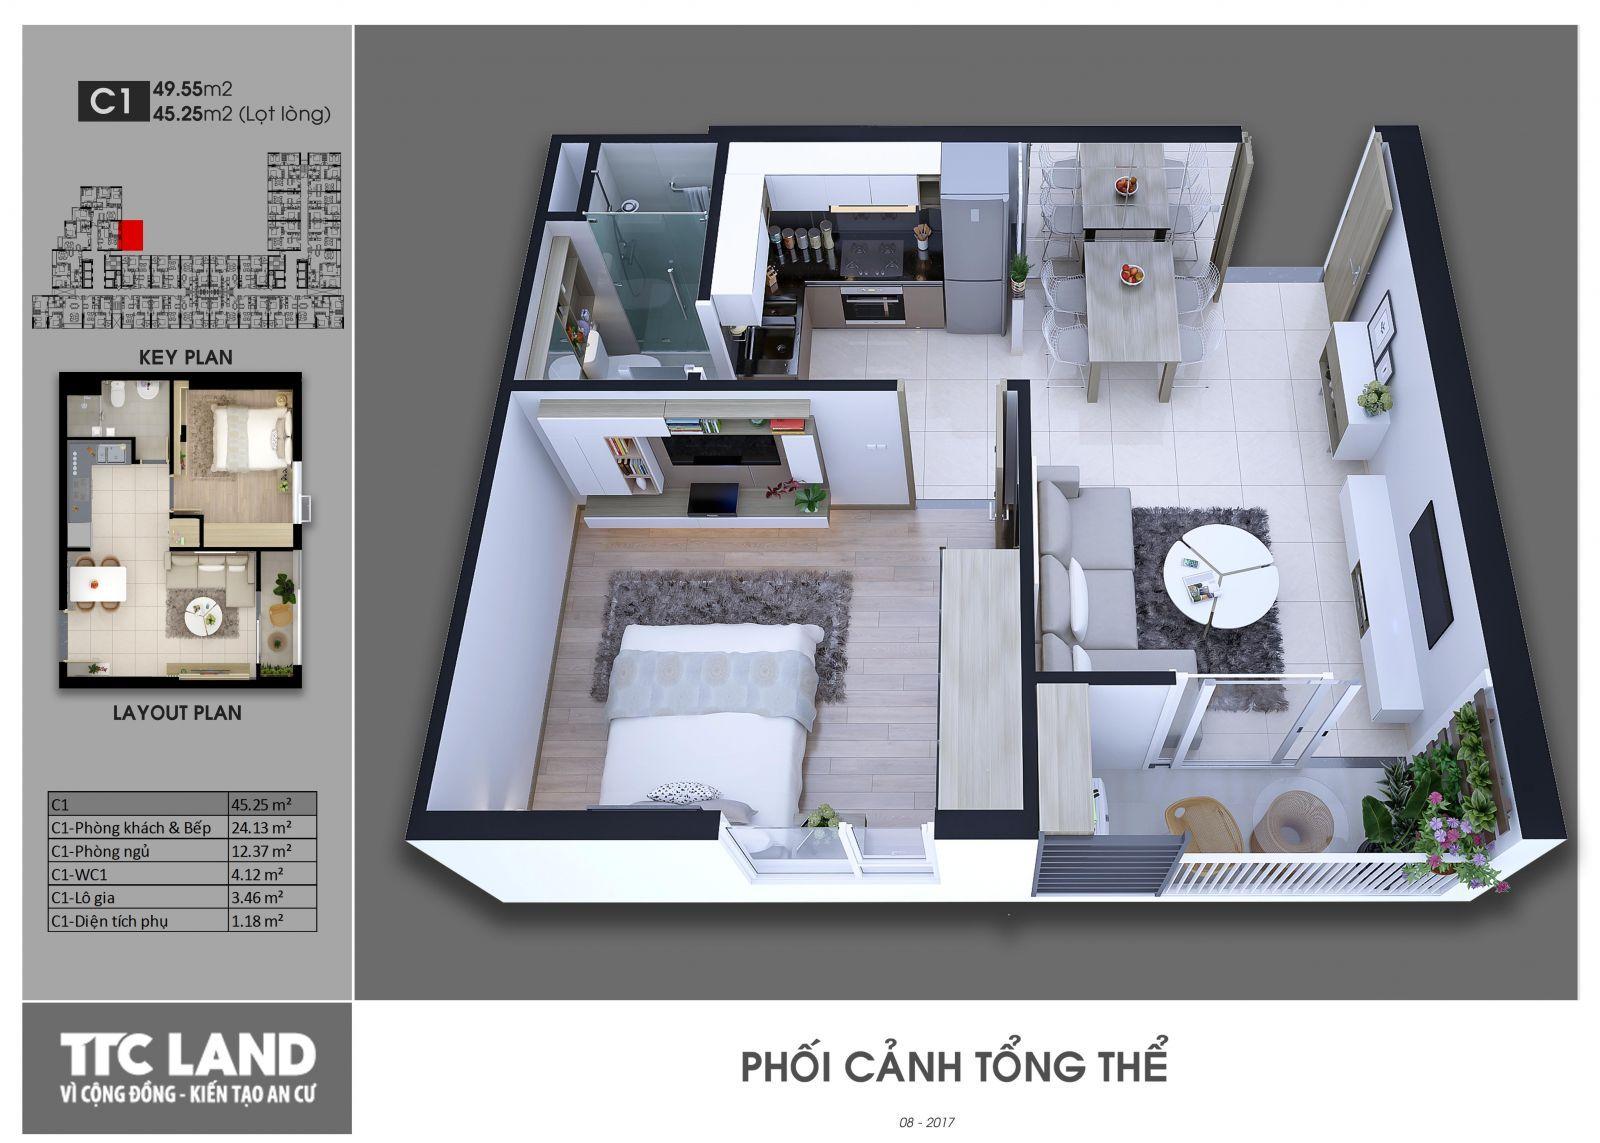 Squaland Sang Nhượng Căn Hộ Carillon 7 Căn 2pn Giá 1 950 Tỷ Apartment Layout Small Apartments House Floor Plans